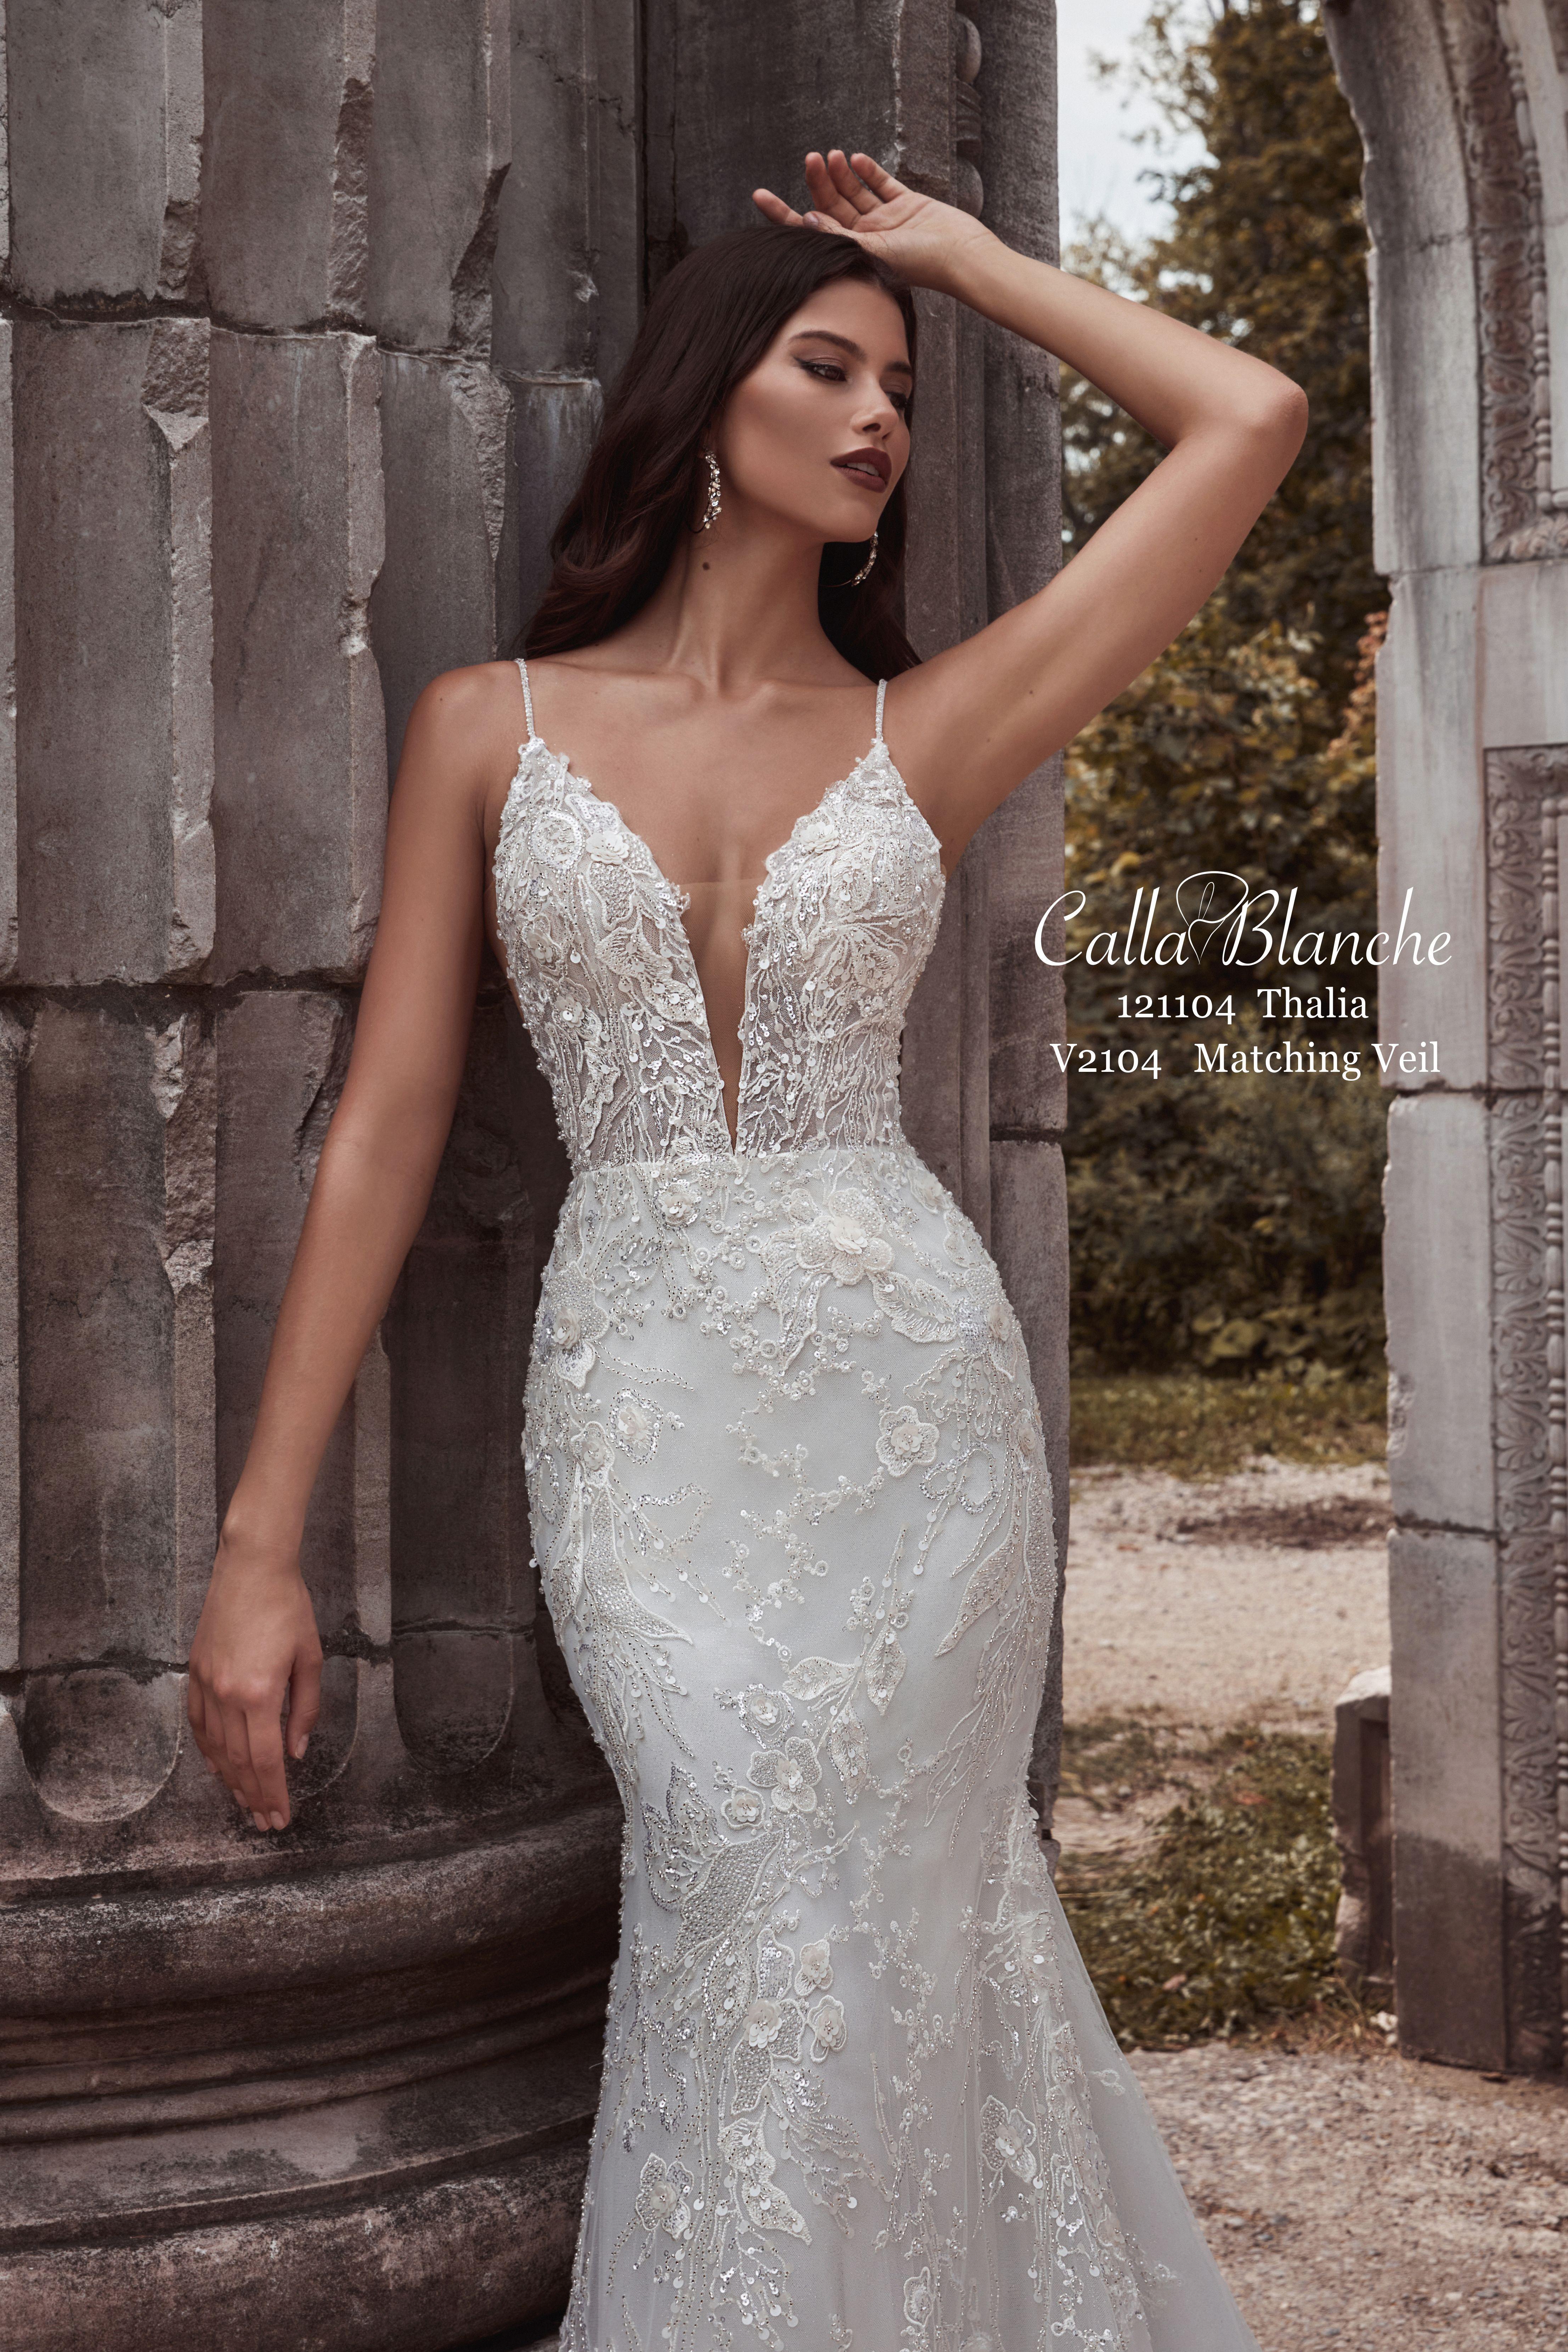 Thalia Sleek Wedding Dress Wedding Dresses Purchase Wedding Dress [ 6638 x 4426 Pixel ]